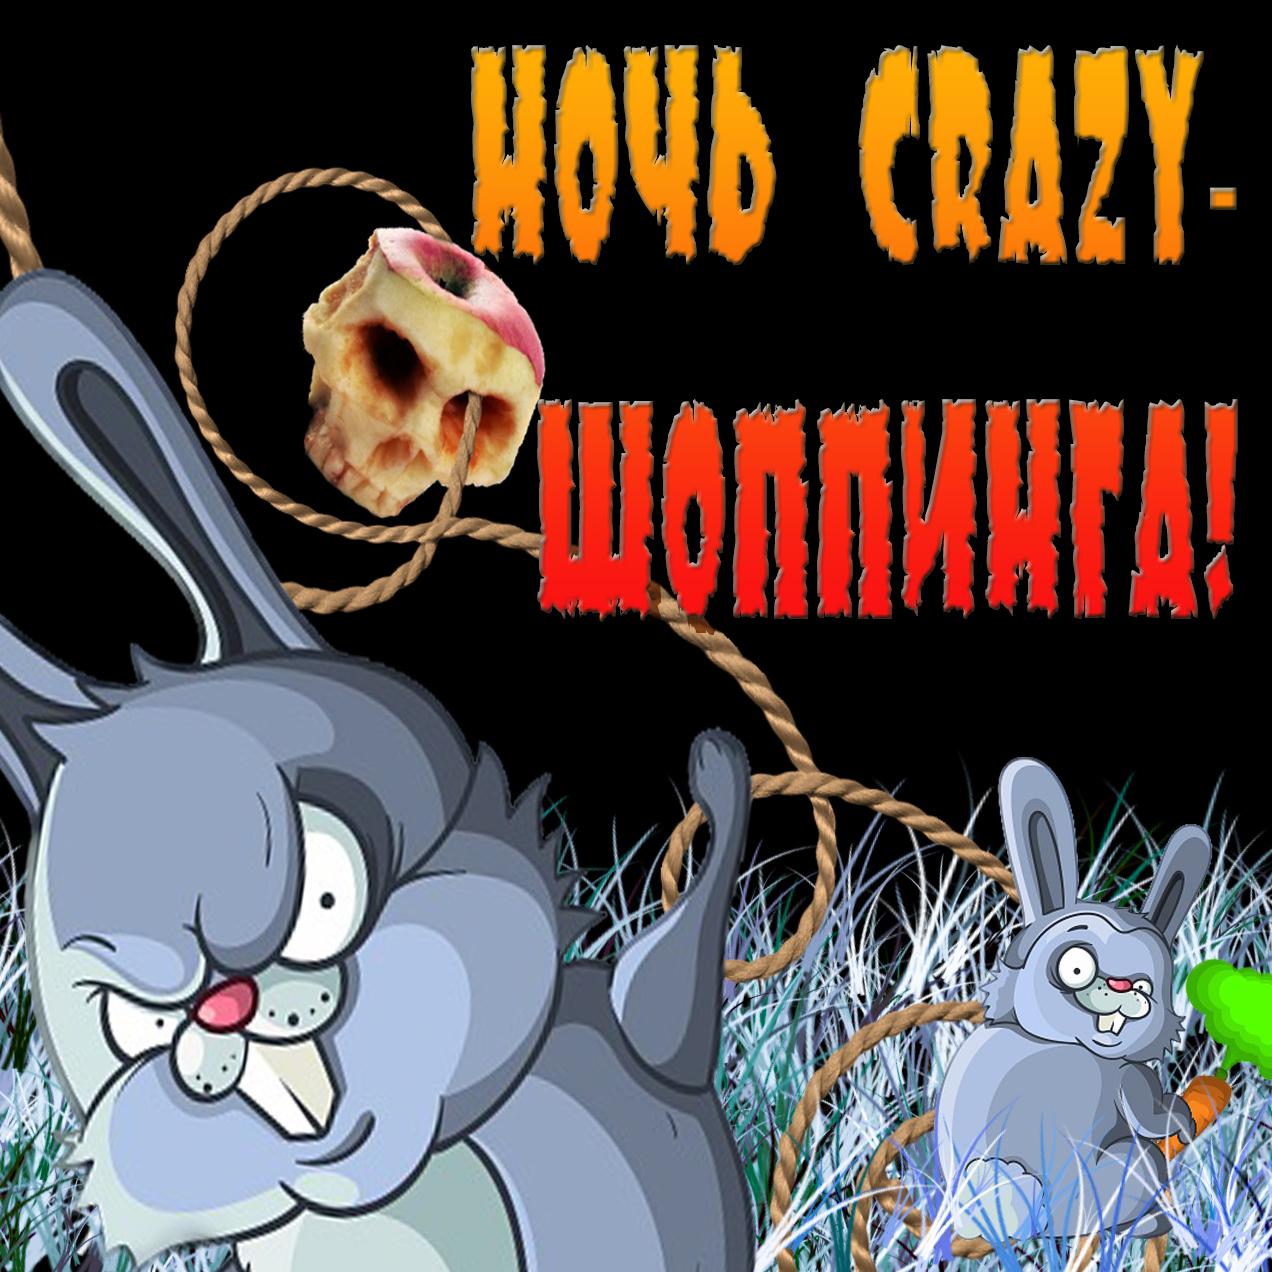 "���� ""CRAZY-��������"" �� ��! �� ������!!!������ � 23-00 1 ���� �� 6-00 ���� 2 ���� �� ������� ��������� ������ � ���������� ���.������!"